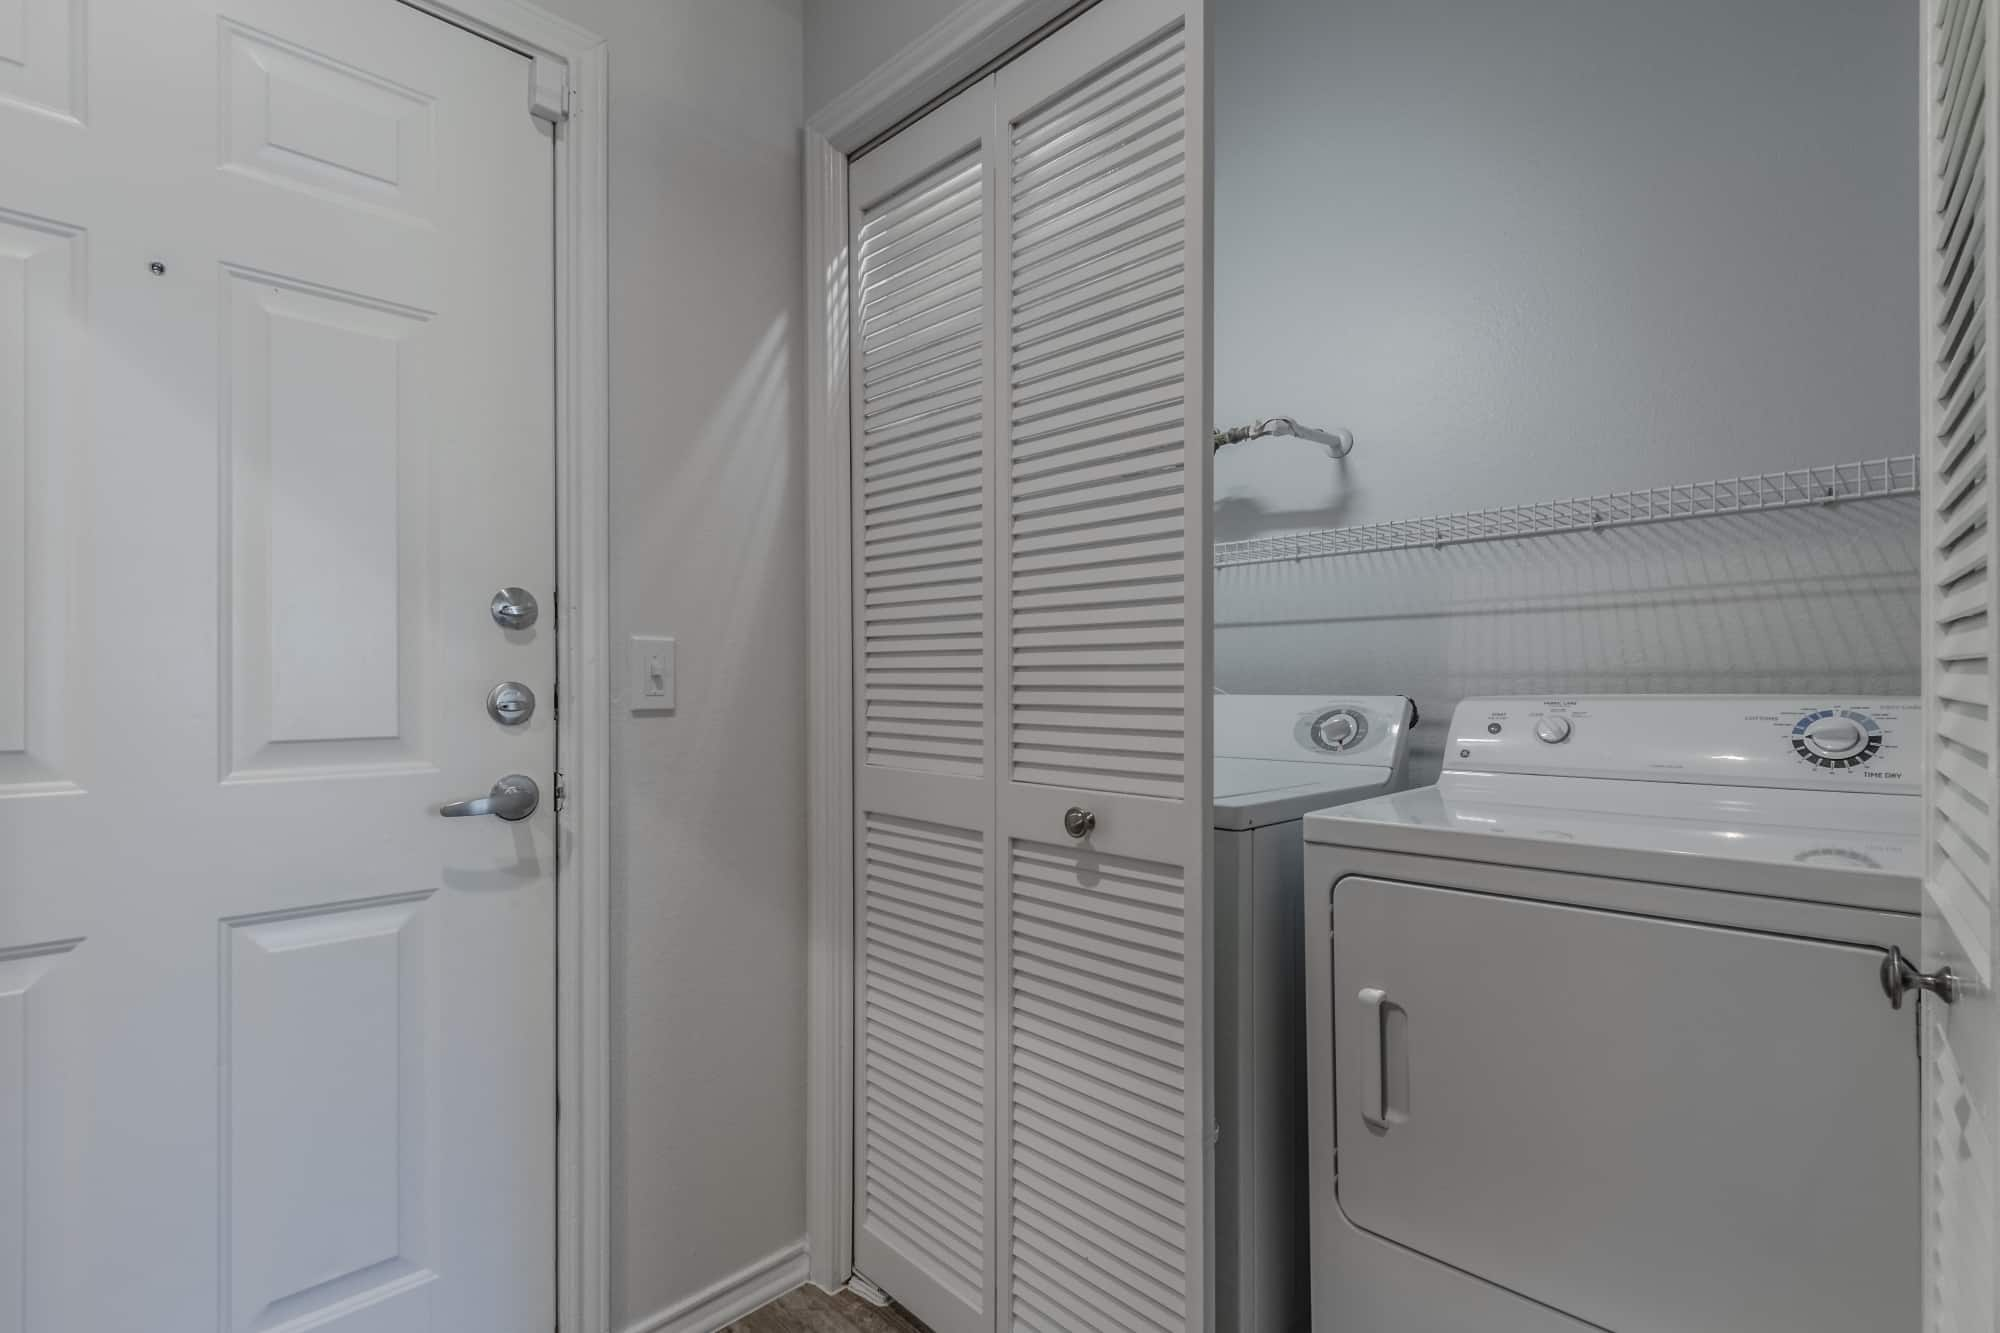 Full-Size Washer/Dryer Hookups